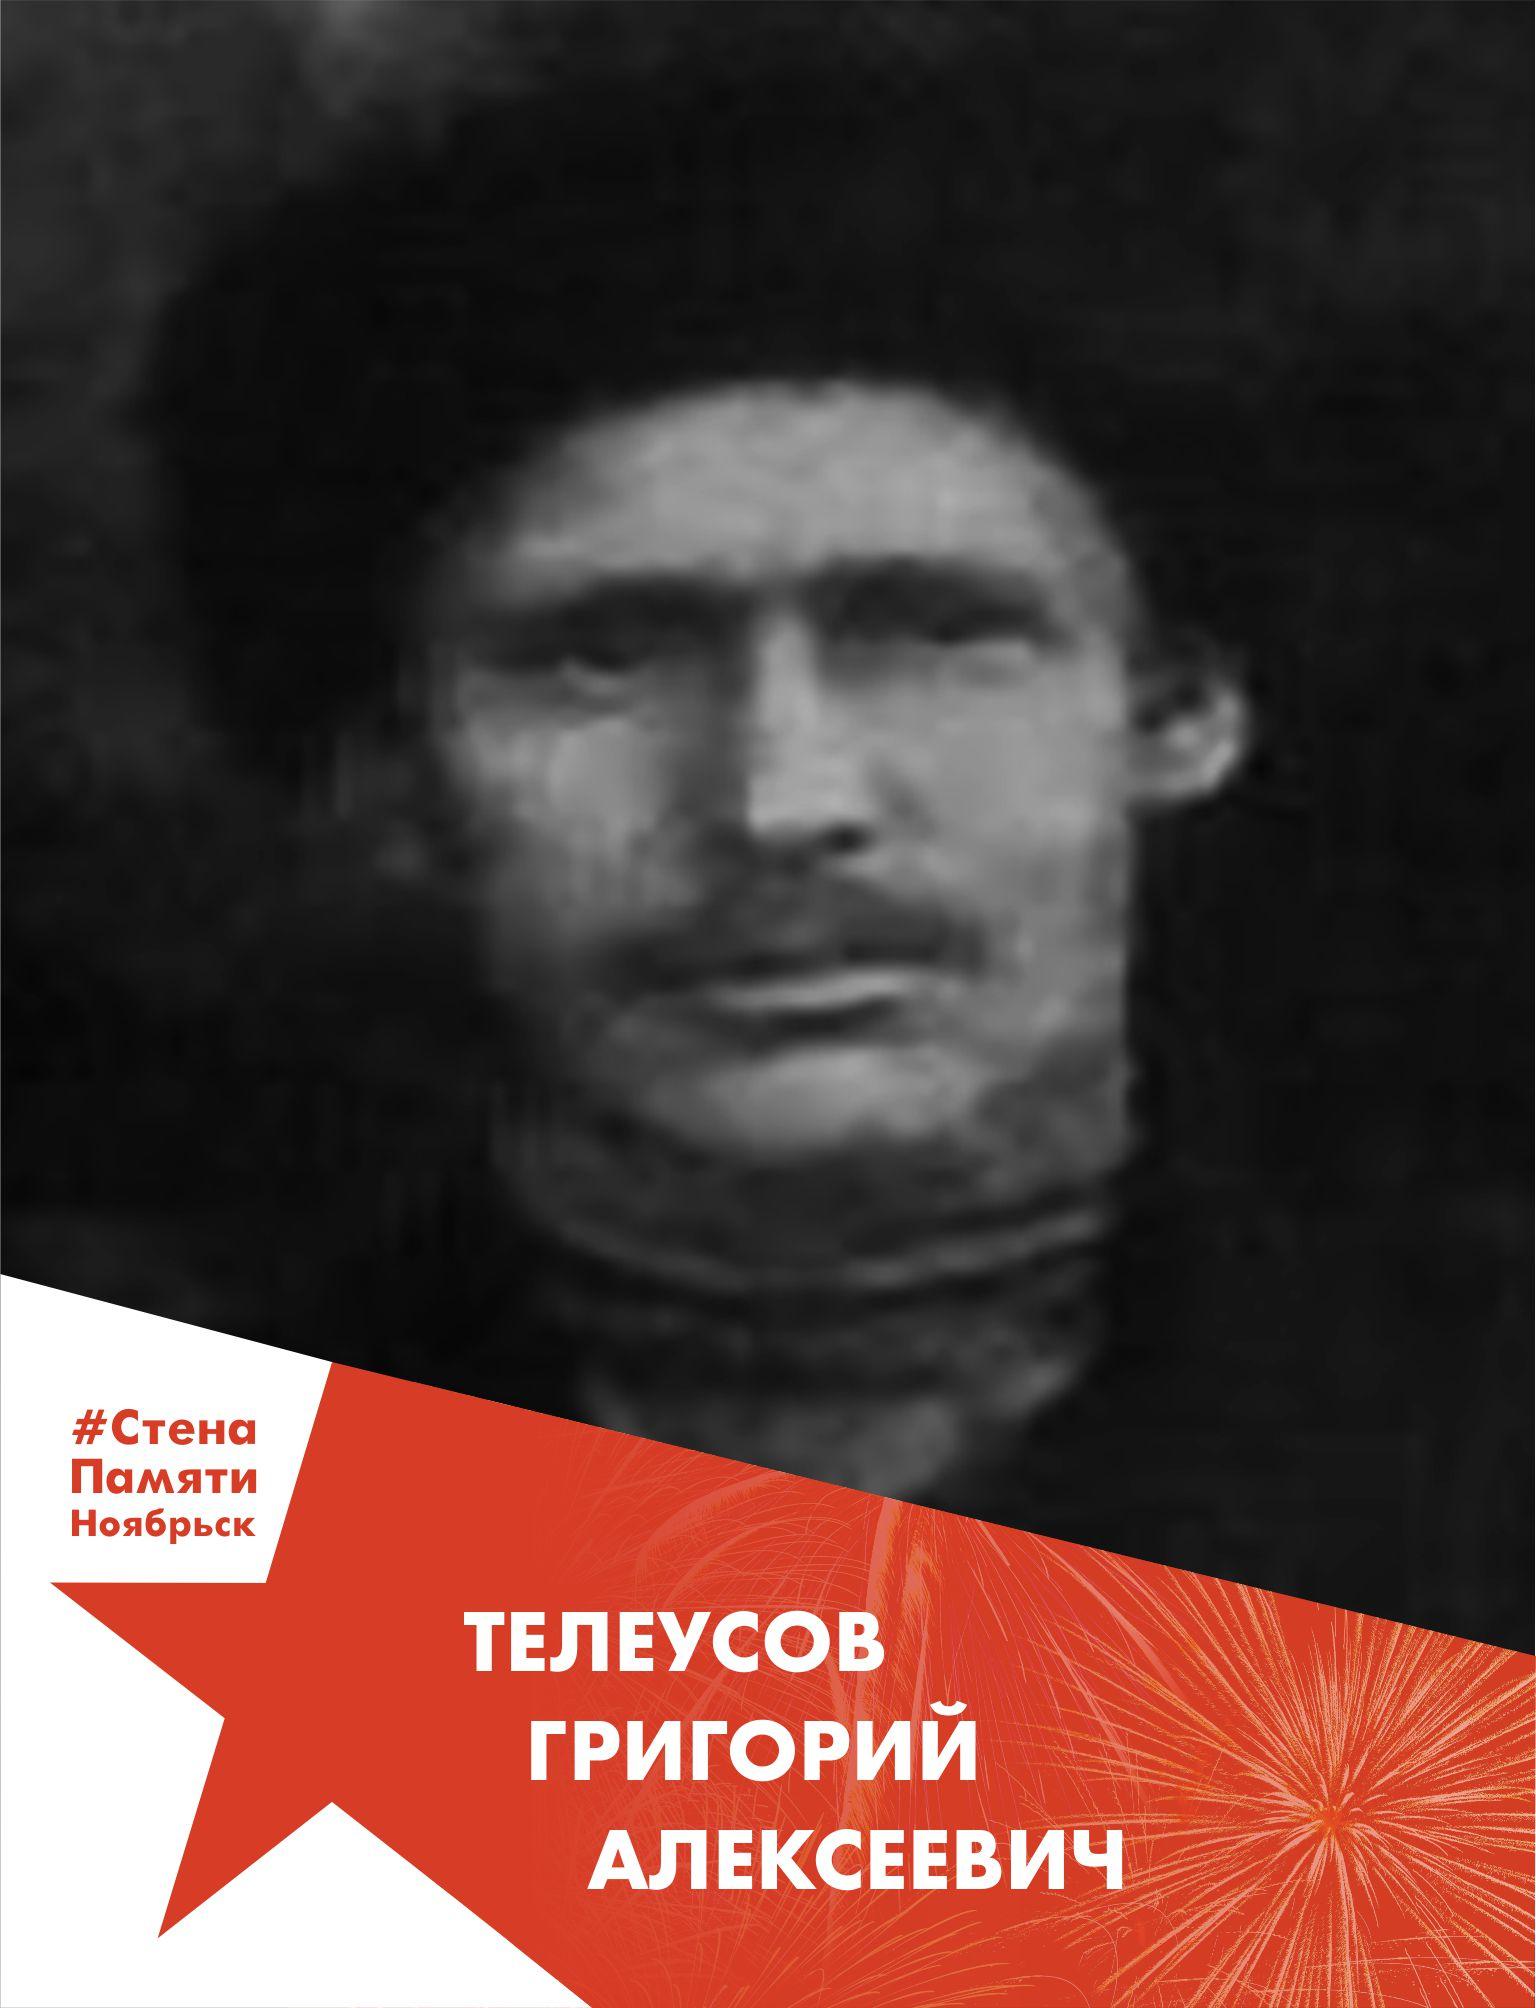 Телеусов Григорий Алексеевич